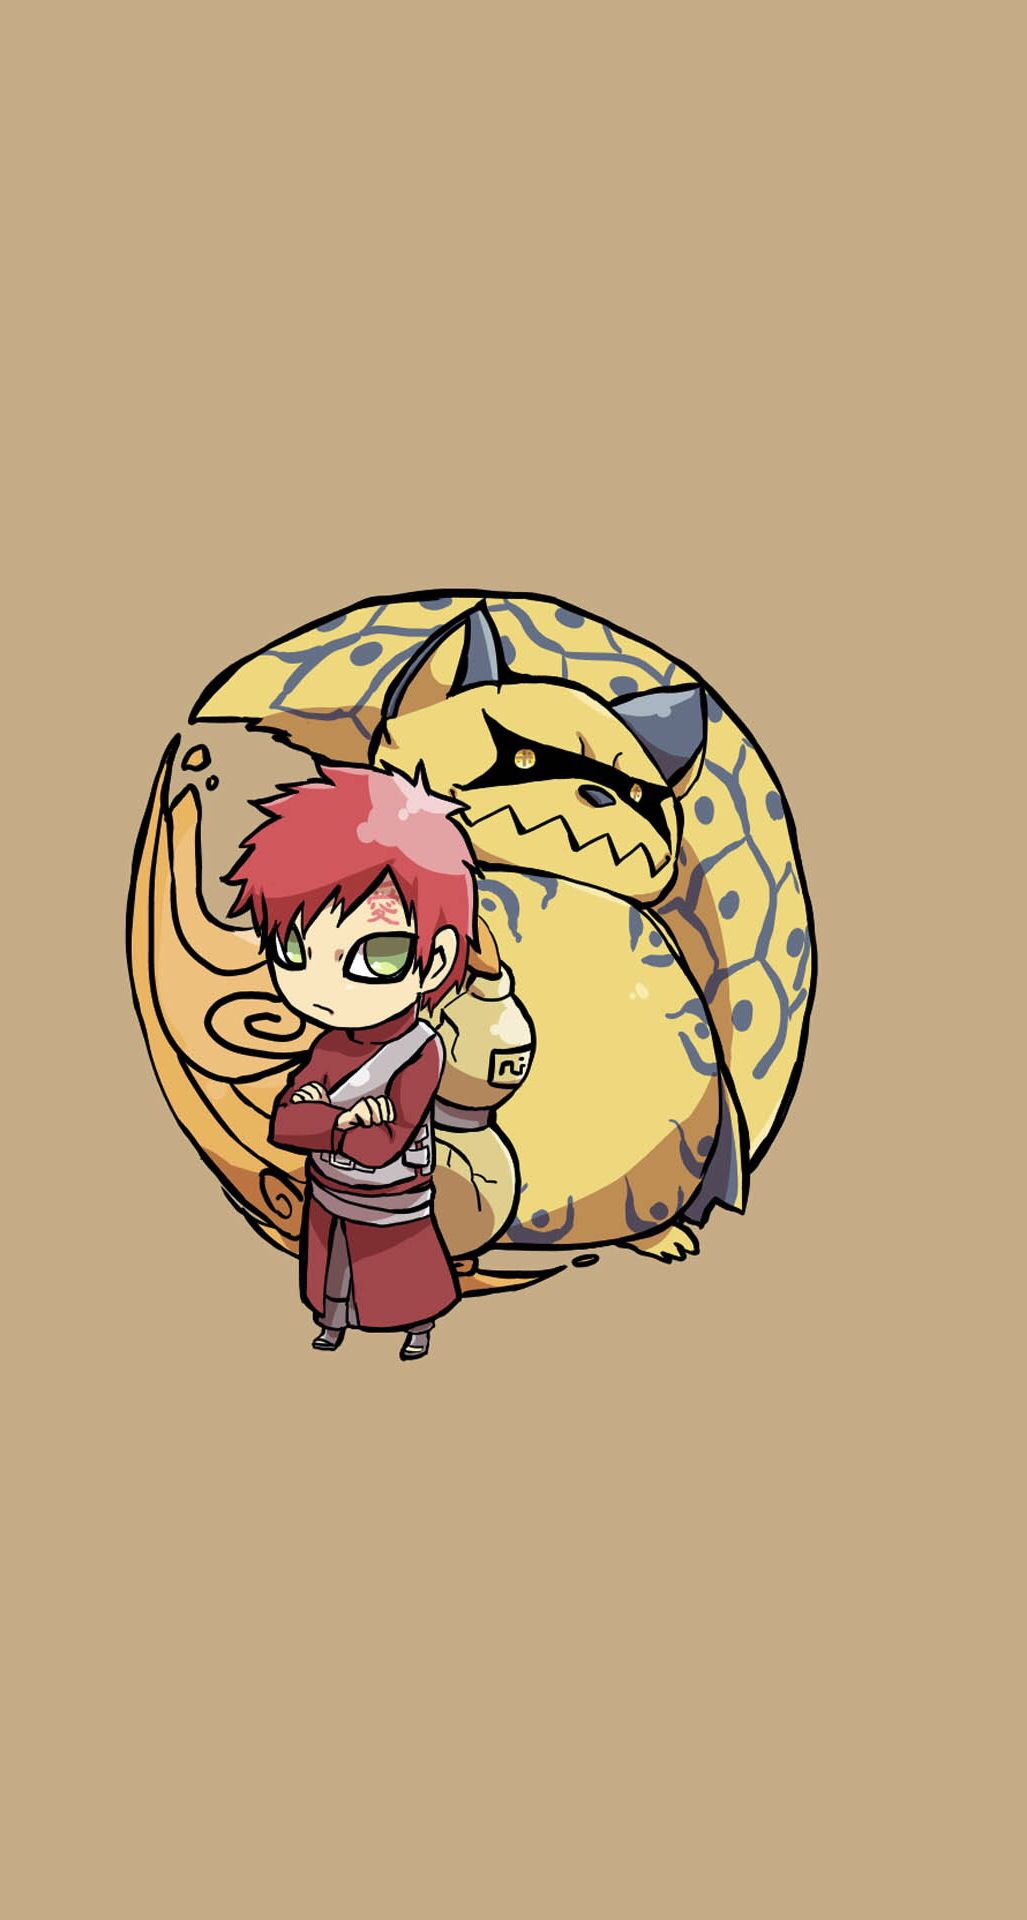 Gaara And Shukaku The Ichibi